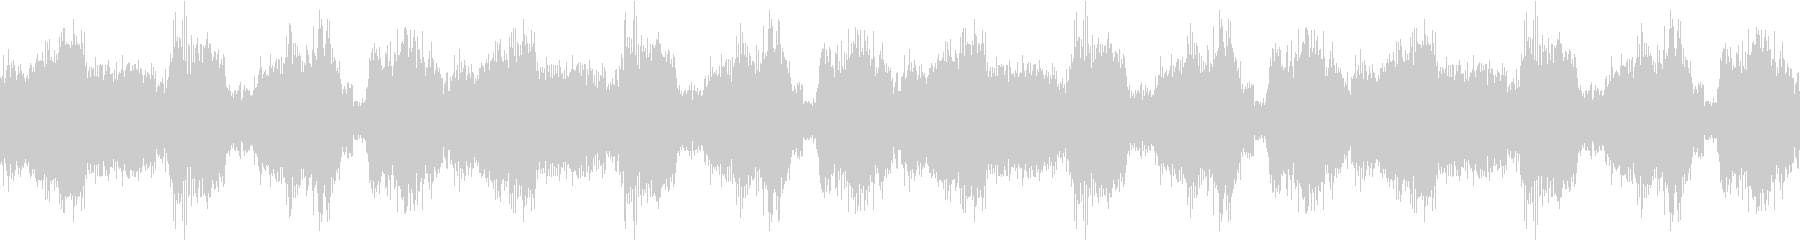 House コードシンセ 5 音楽制作用の未再生の波形